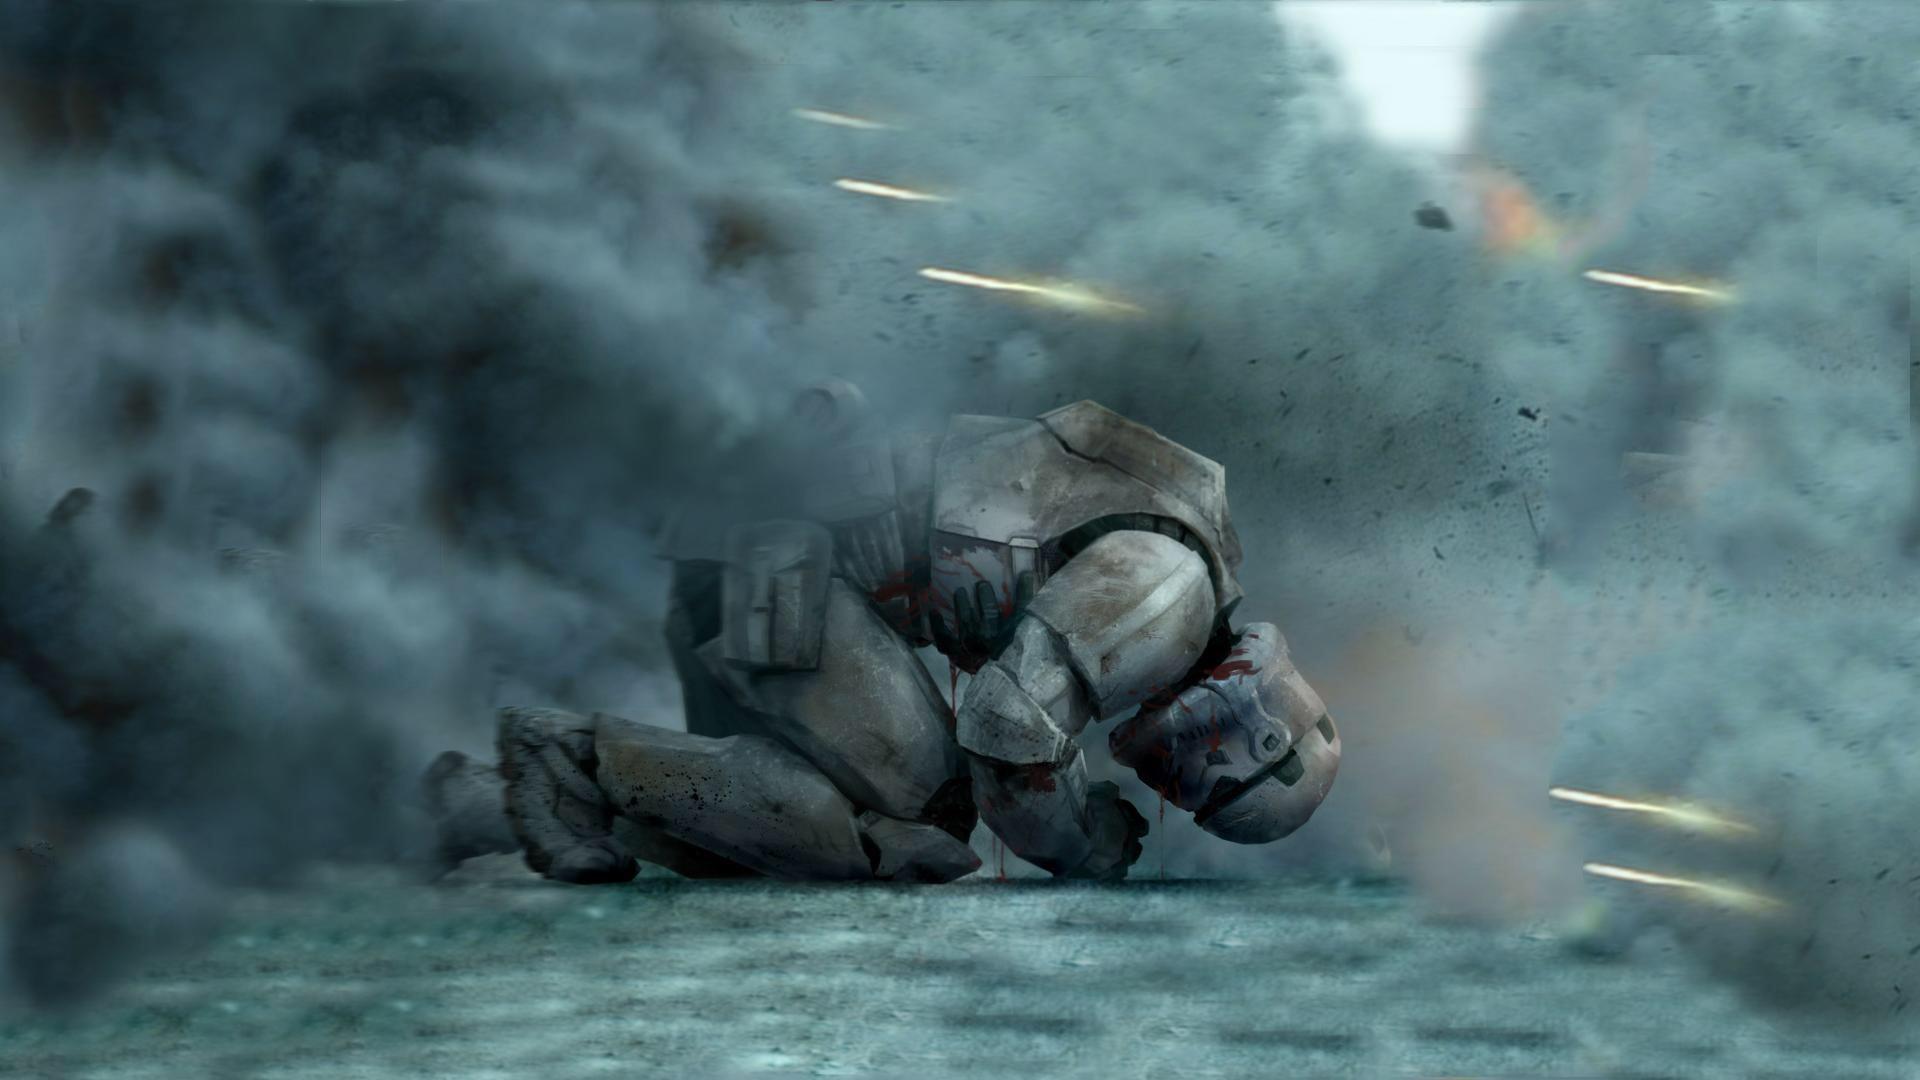 #Star Wars. Fallen Stormtrooper wallpaper